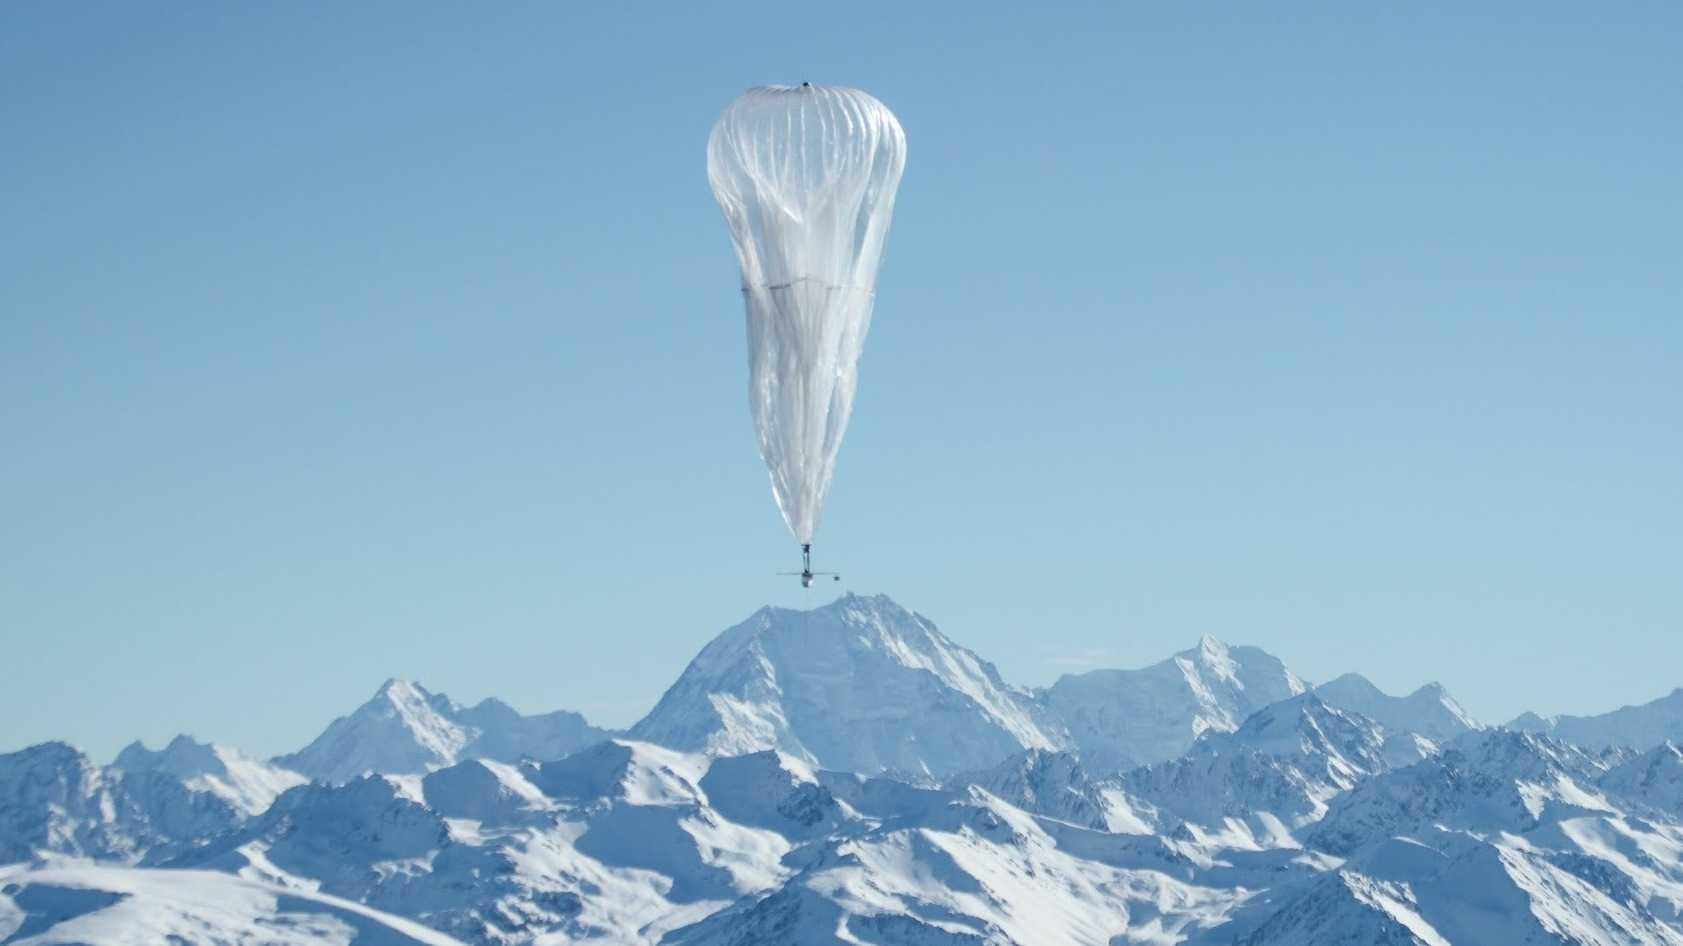 Ballon-Internet für Hurrikan-Katastrophengebiete